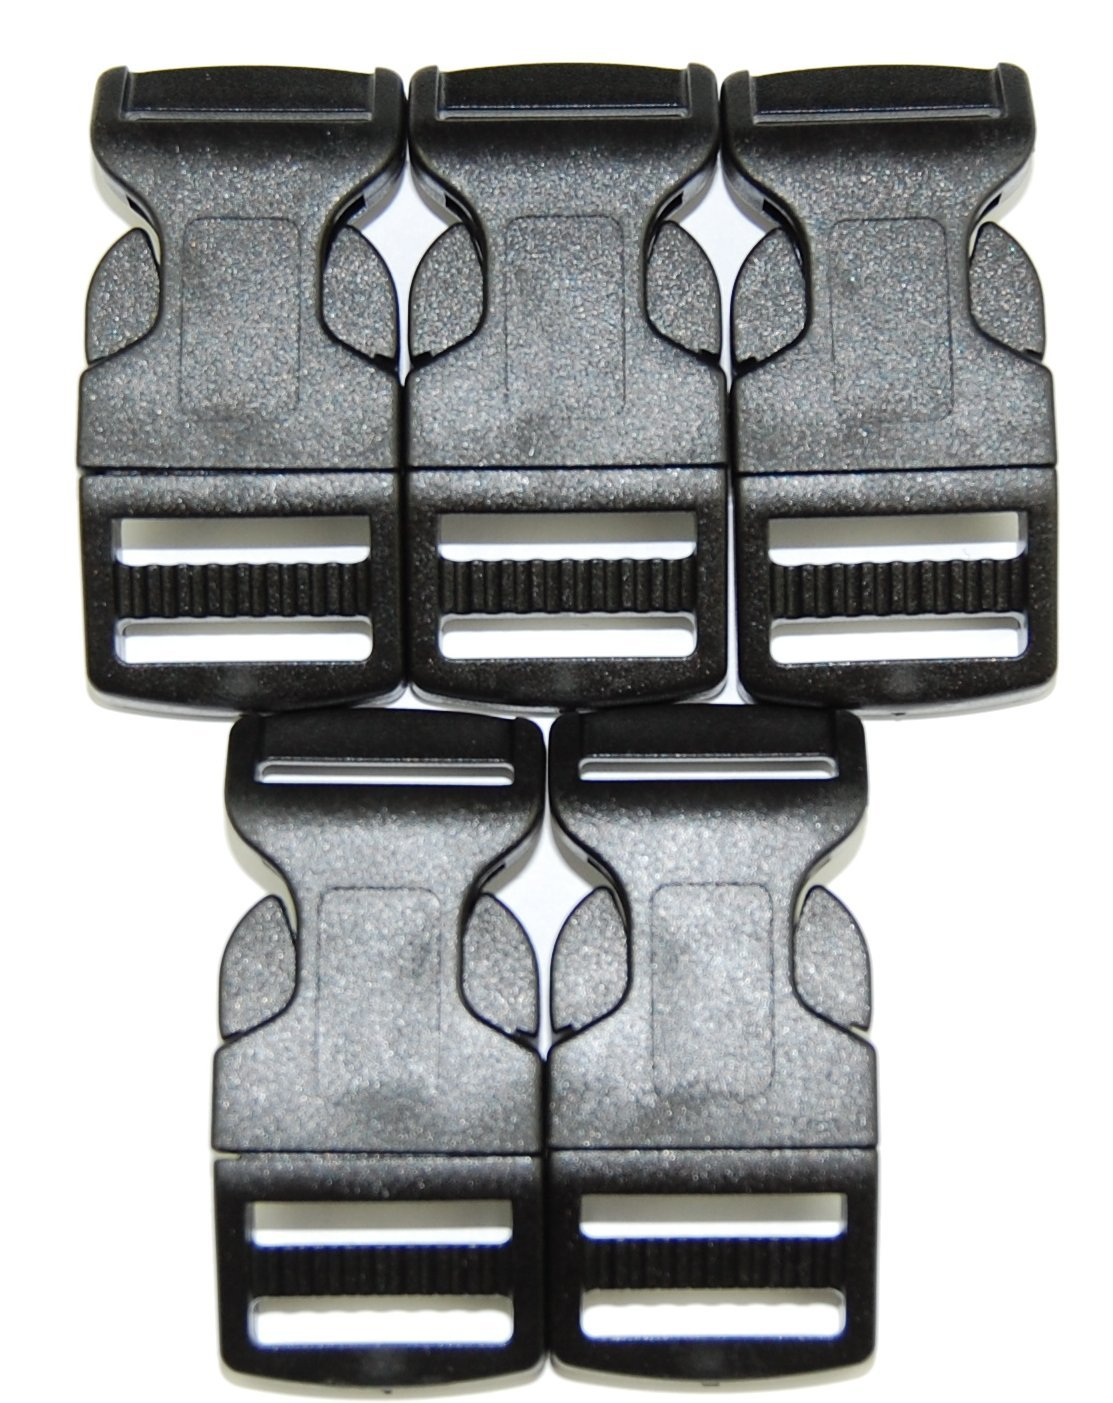 Steckschnalle Steckschlie/ßer gebogen schwarz 20mm versch Mengen